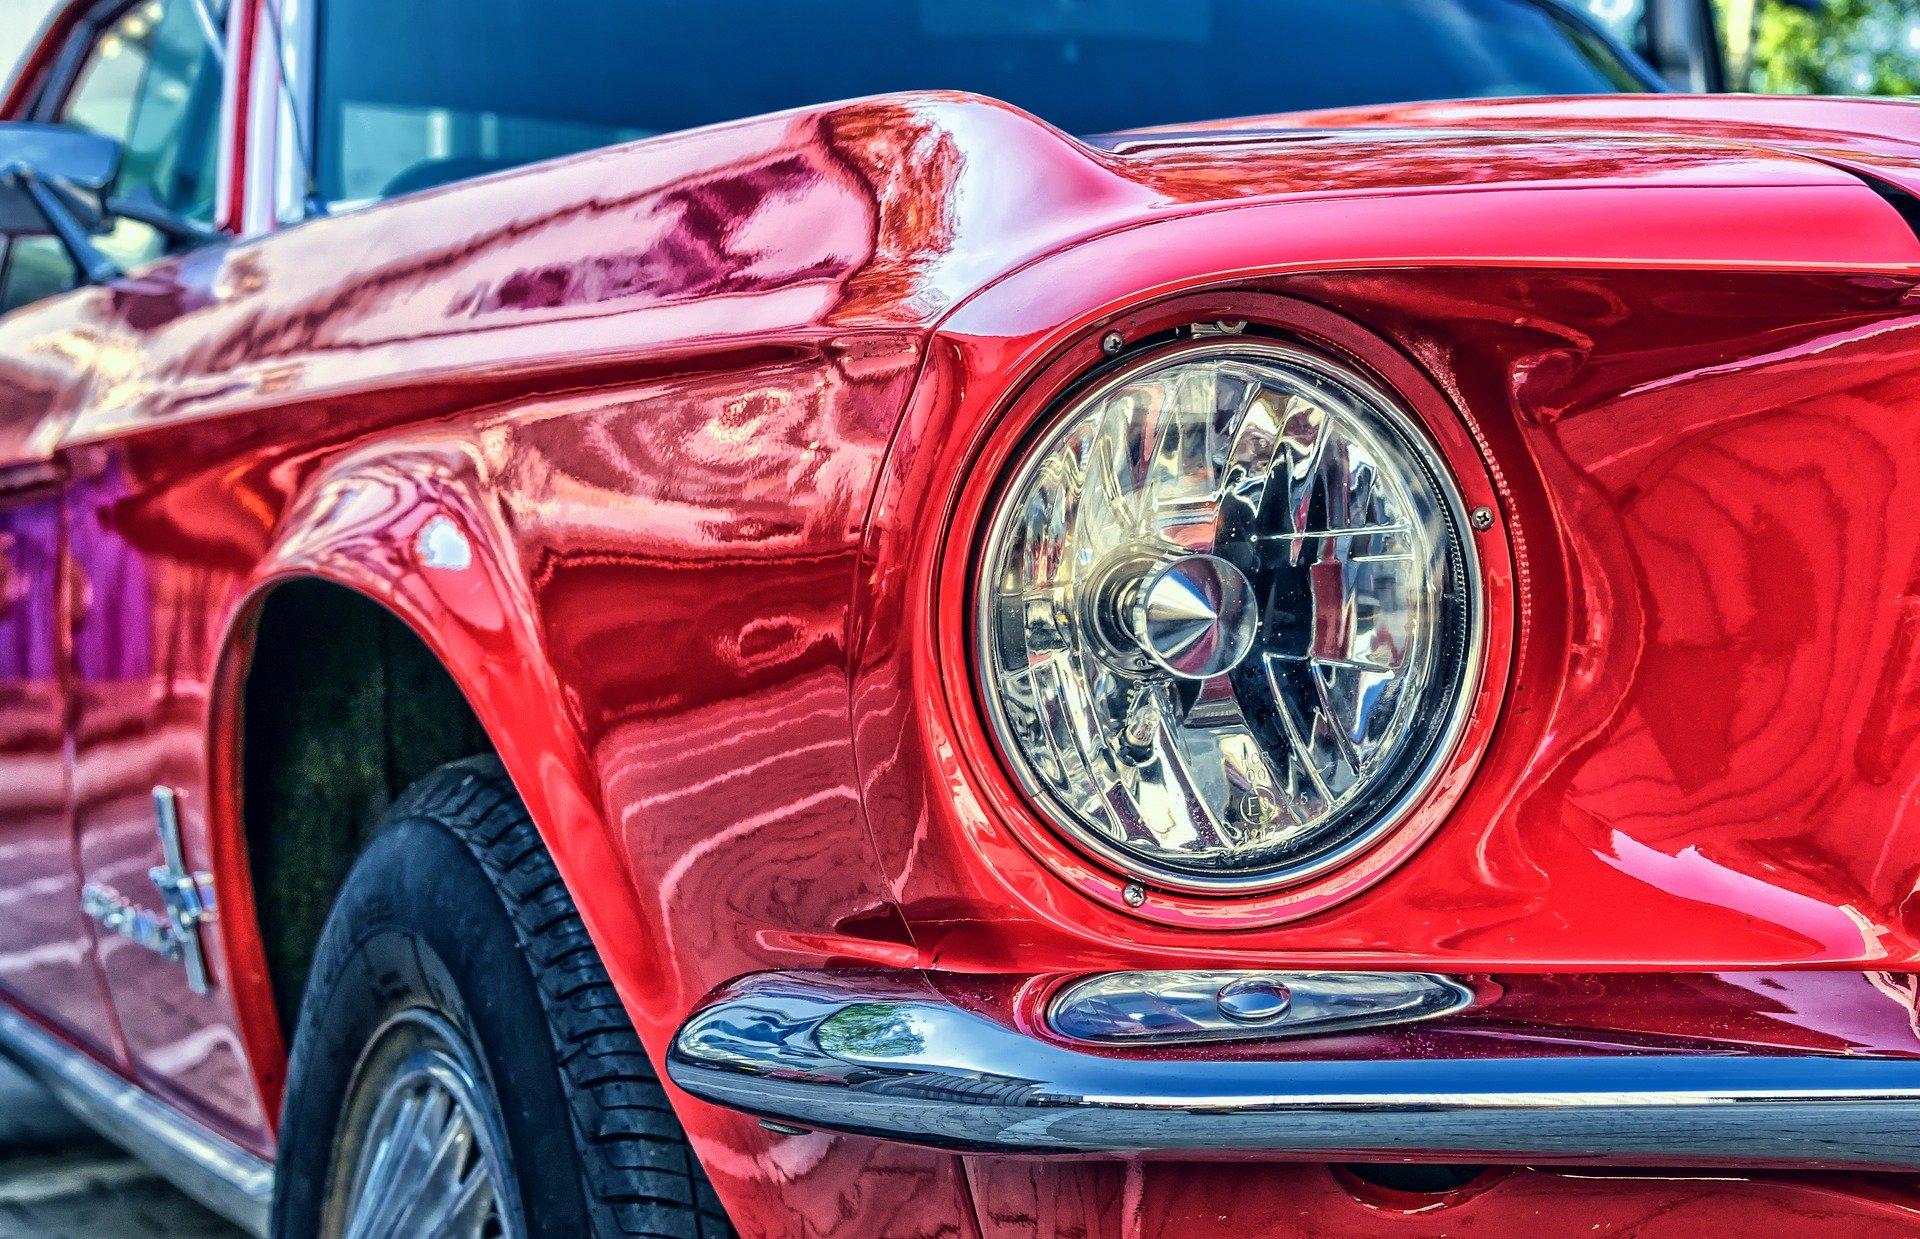 Classic Red Mustang in Islip Long Island - VeteranCarDonations.org